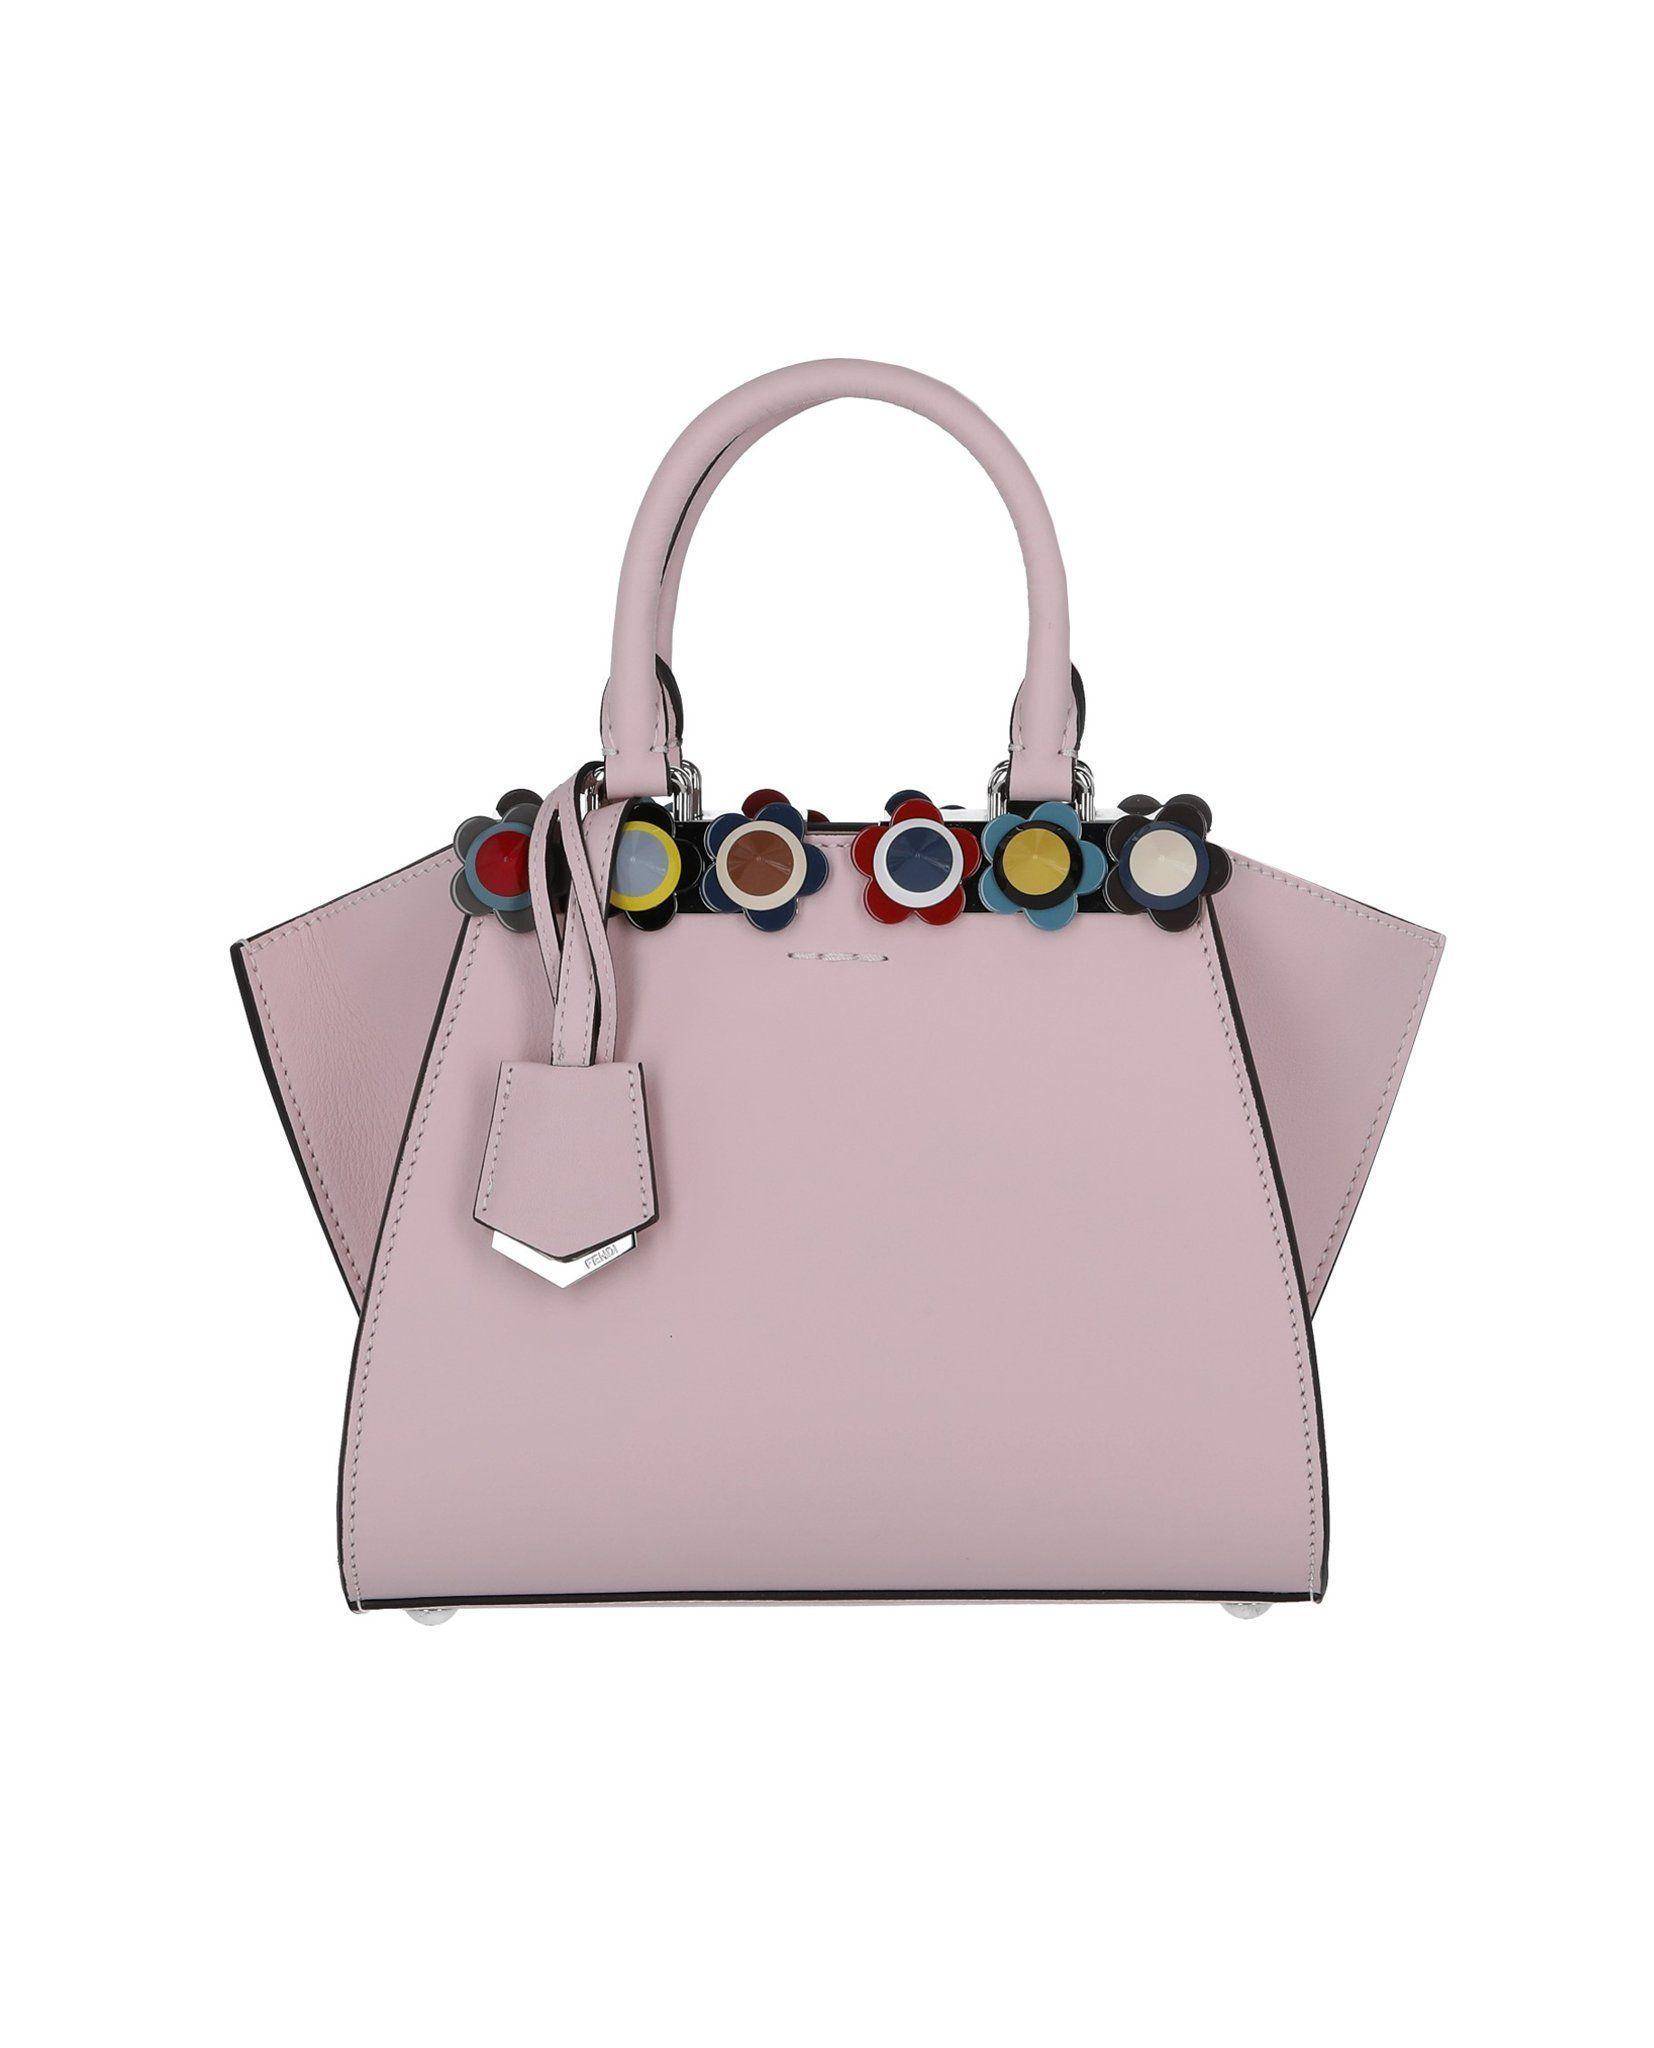 339d96da9b96 Fendi Mini 3Jours Floral Stud Bag